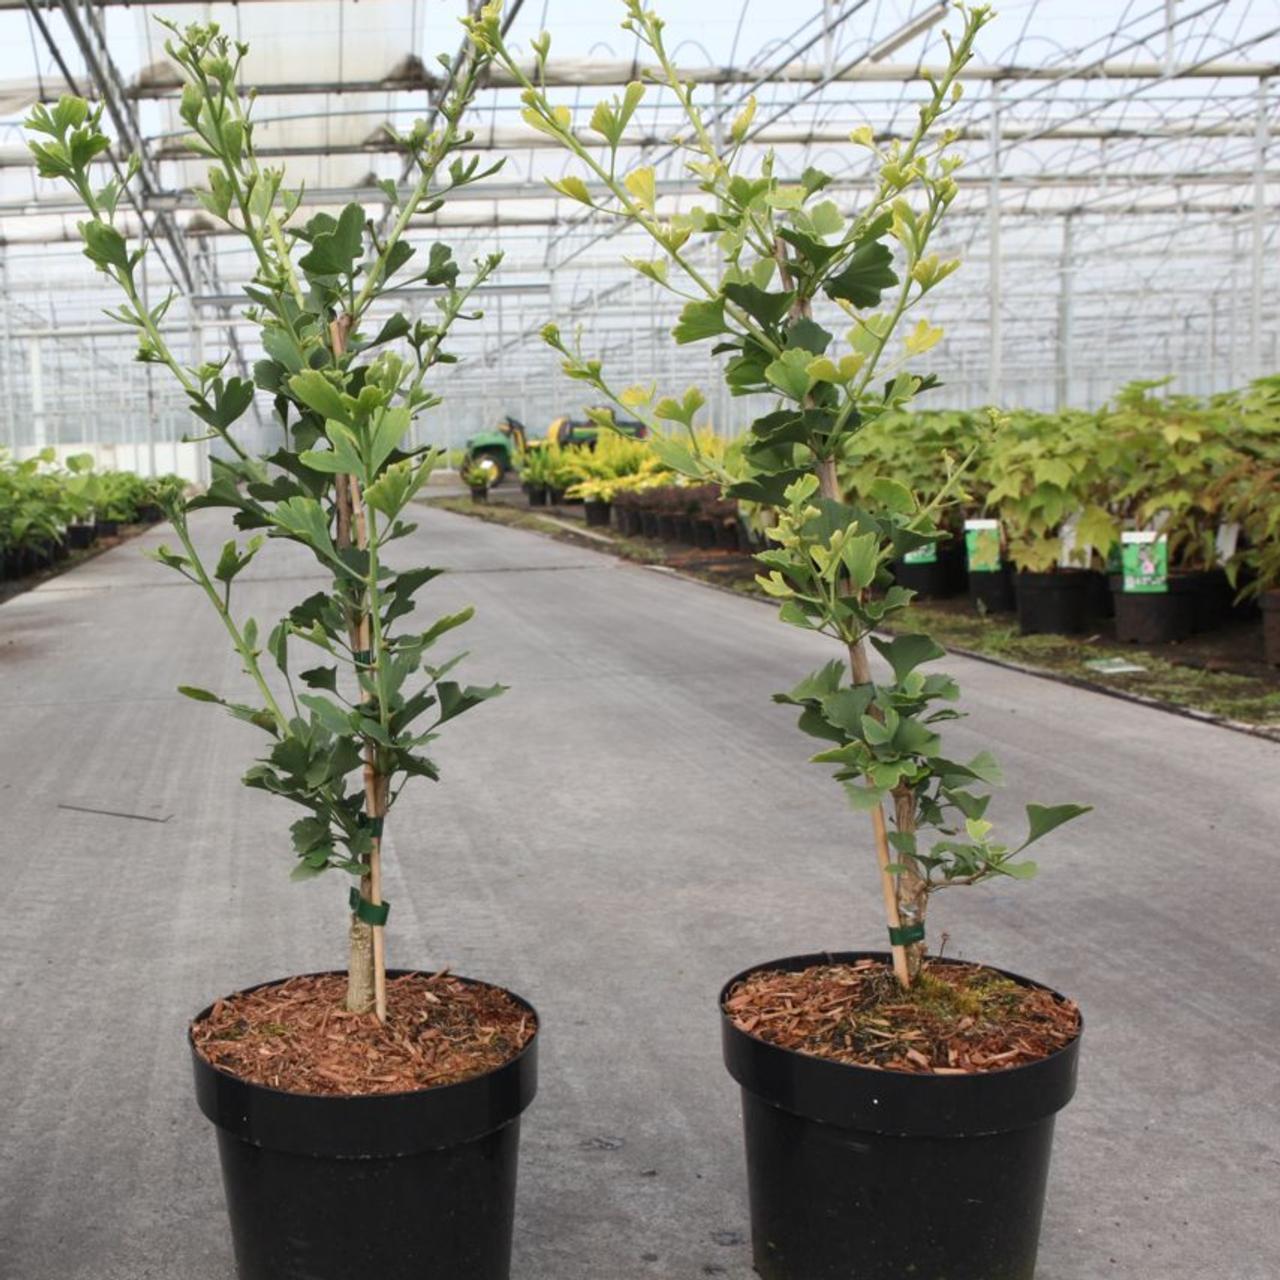 Ginkgo biloba 'Menhir' plant